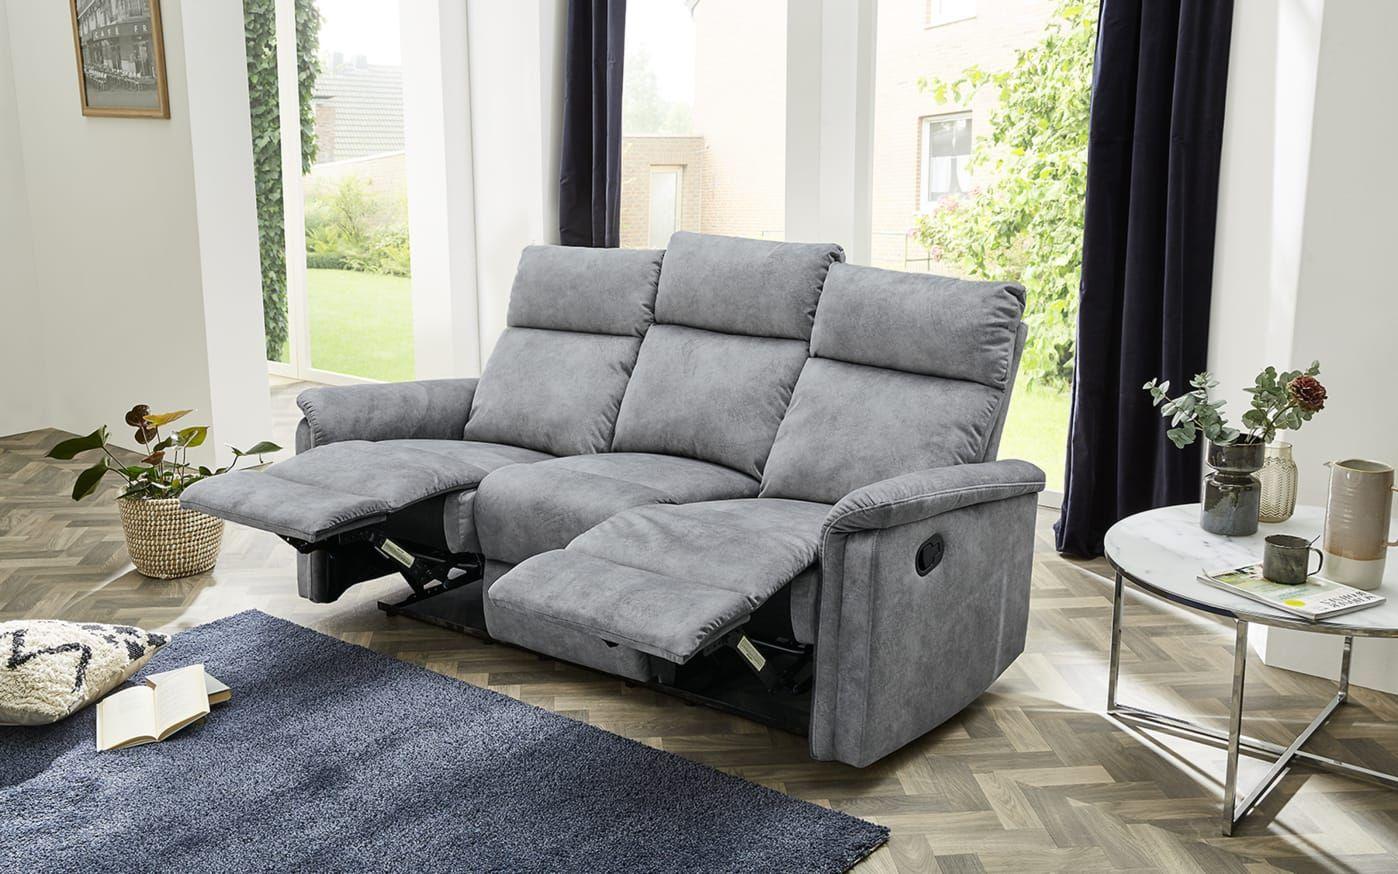 76 Exotisch Elektrisches Sofa Sofa Mit Relaxfunktion Sofa Design Matratzen Sofa